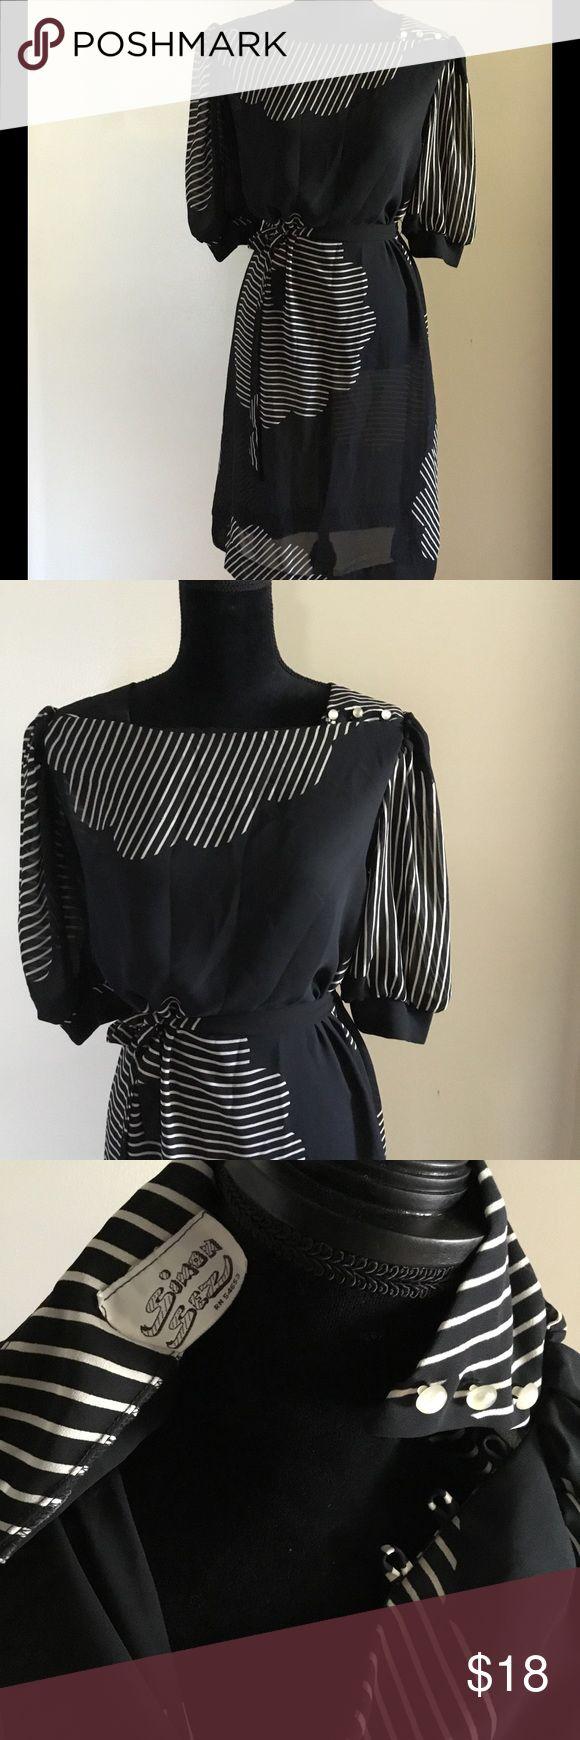 "Vintage Simon Sez Dress Simon Sez tie Black and White, slightly sheer dress. Perfect for date night! Bust 36"" waist 29""-30"" Dresses"